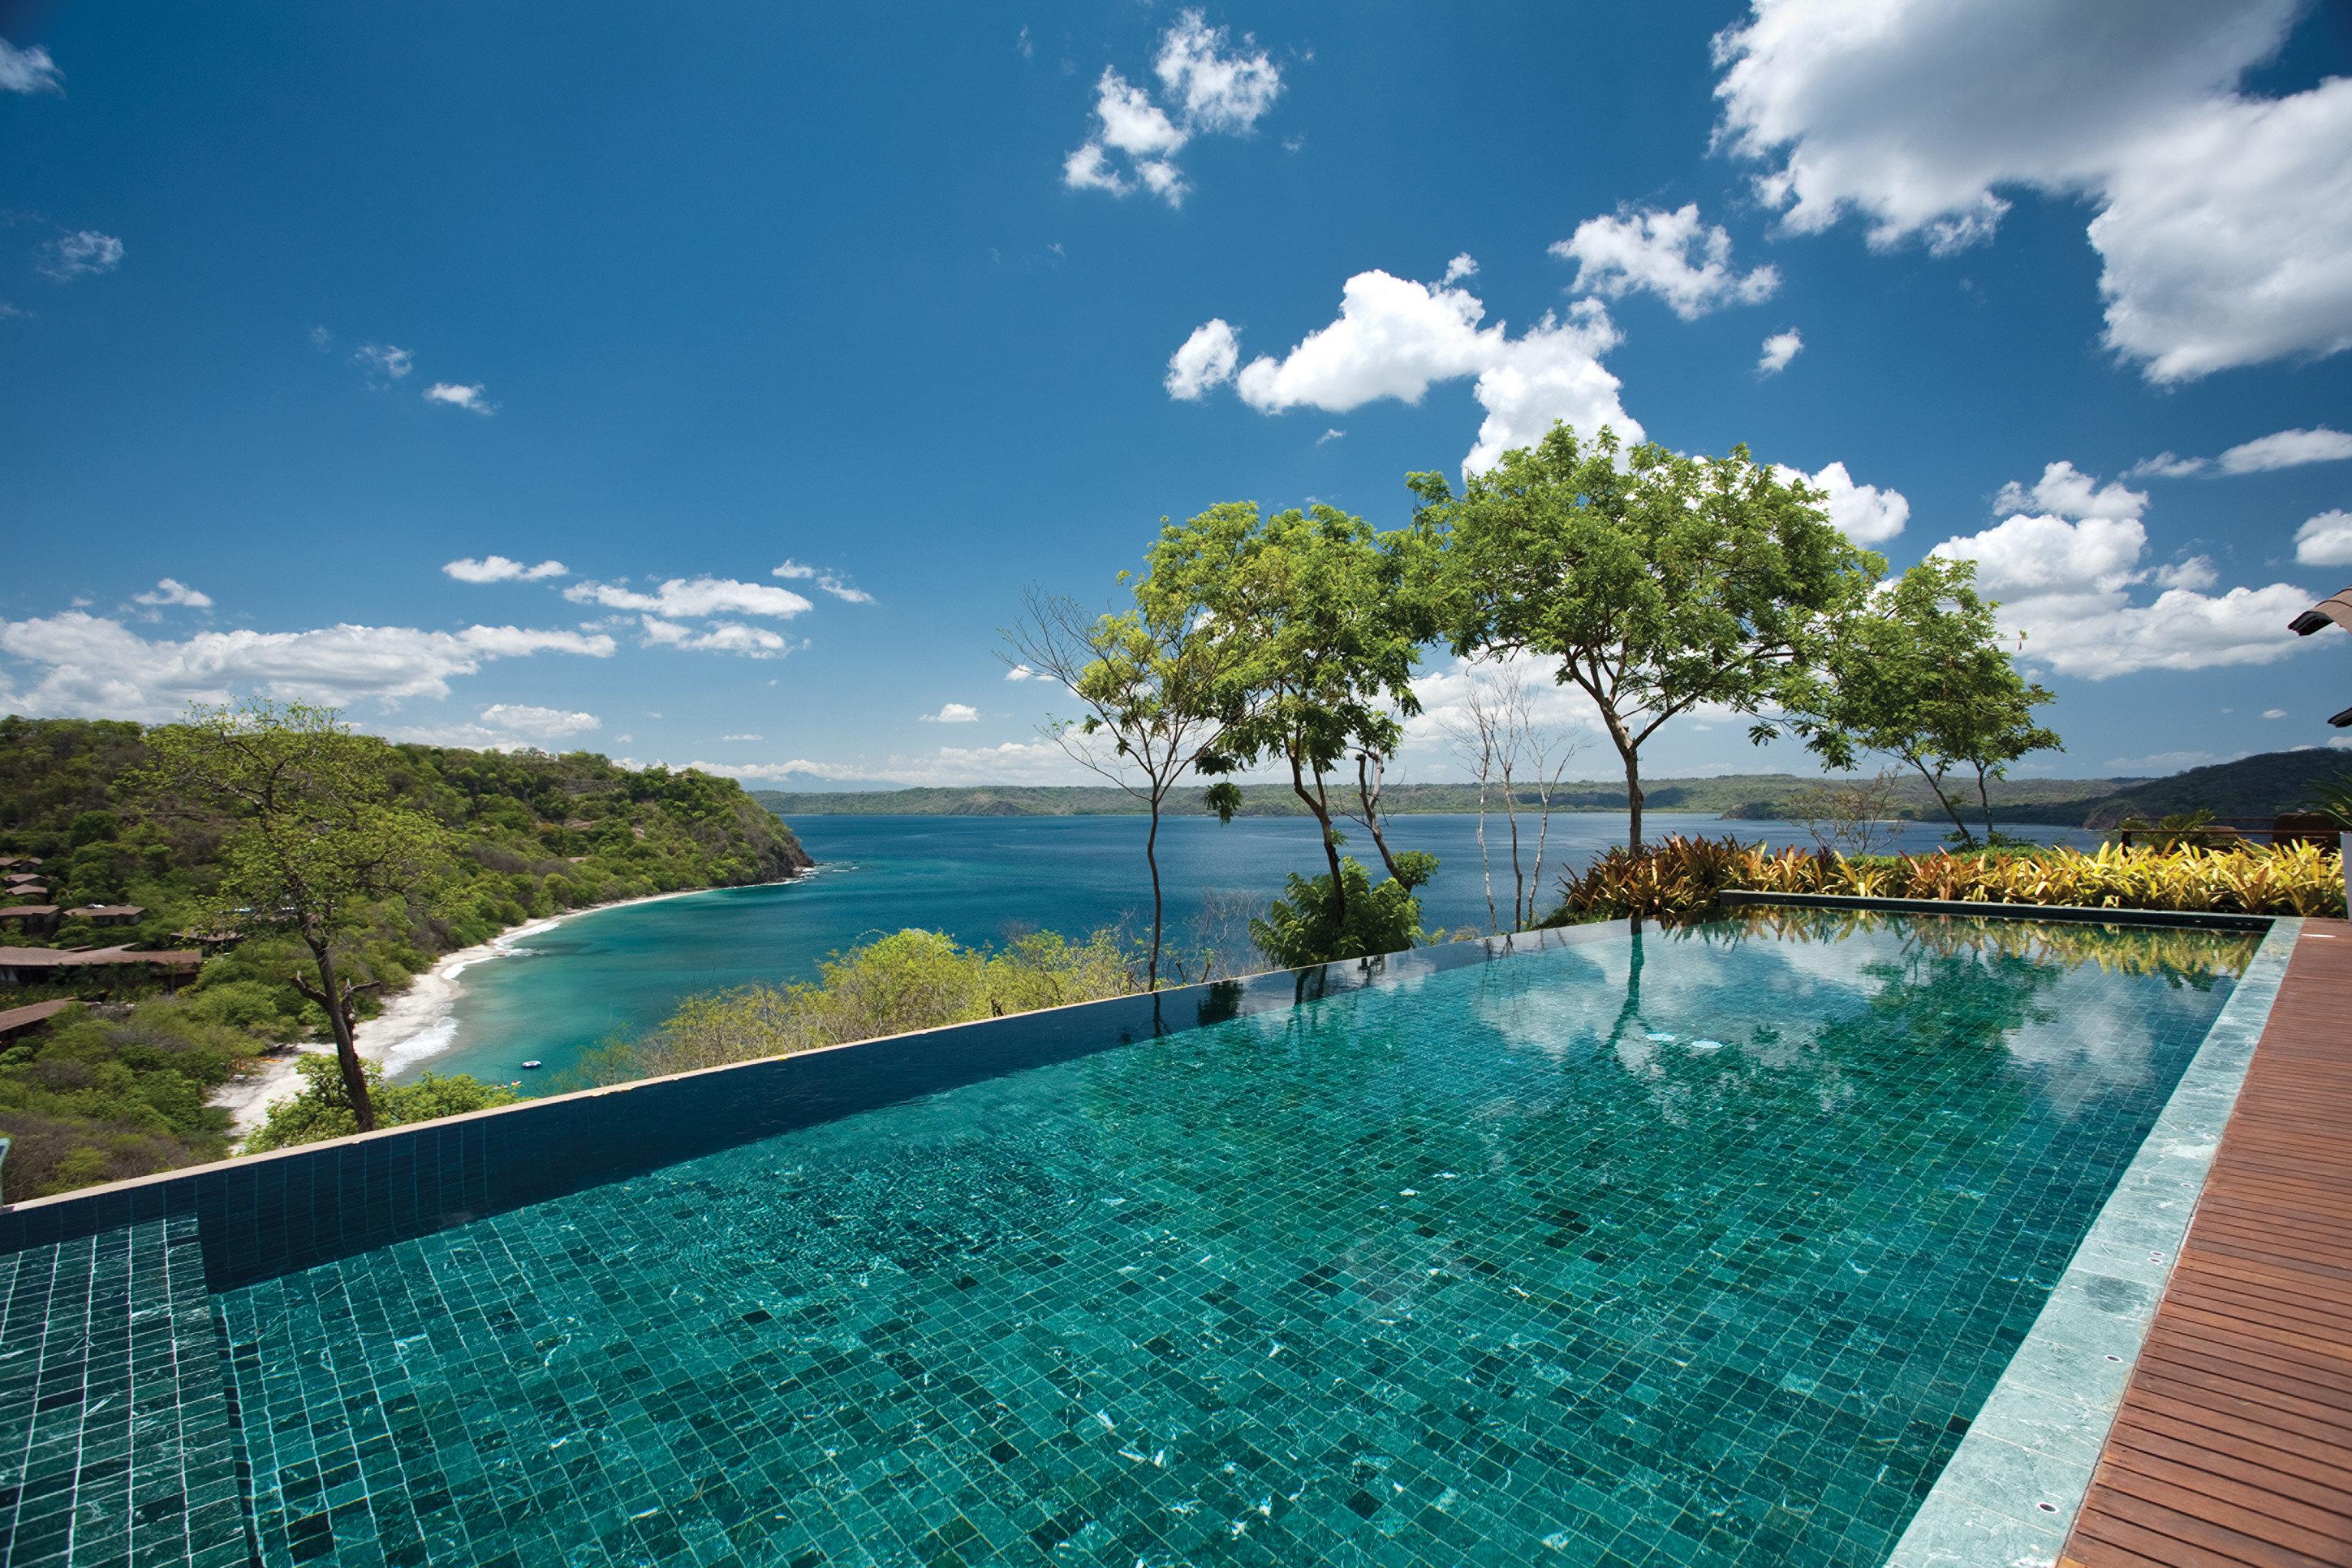 Hotels Living Lounge Luxury Modern Pool Scenic views Trip Ideas sky outdoor swimming pool Sea vacation estate Ocean caribbean Lagoon bay Resort day